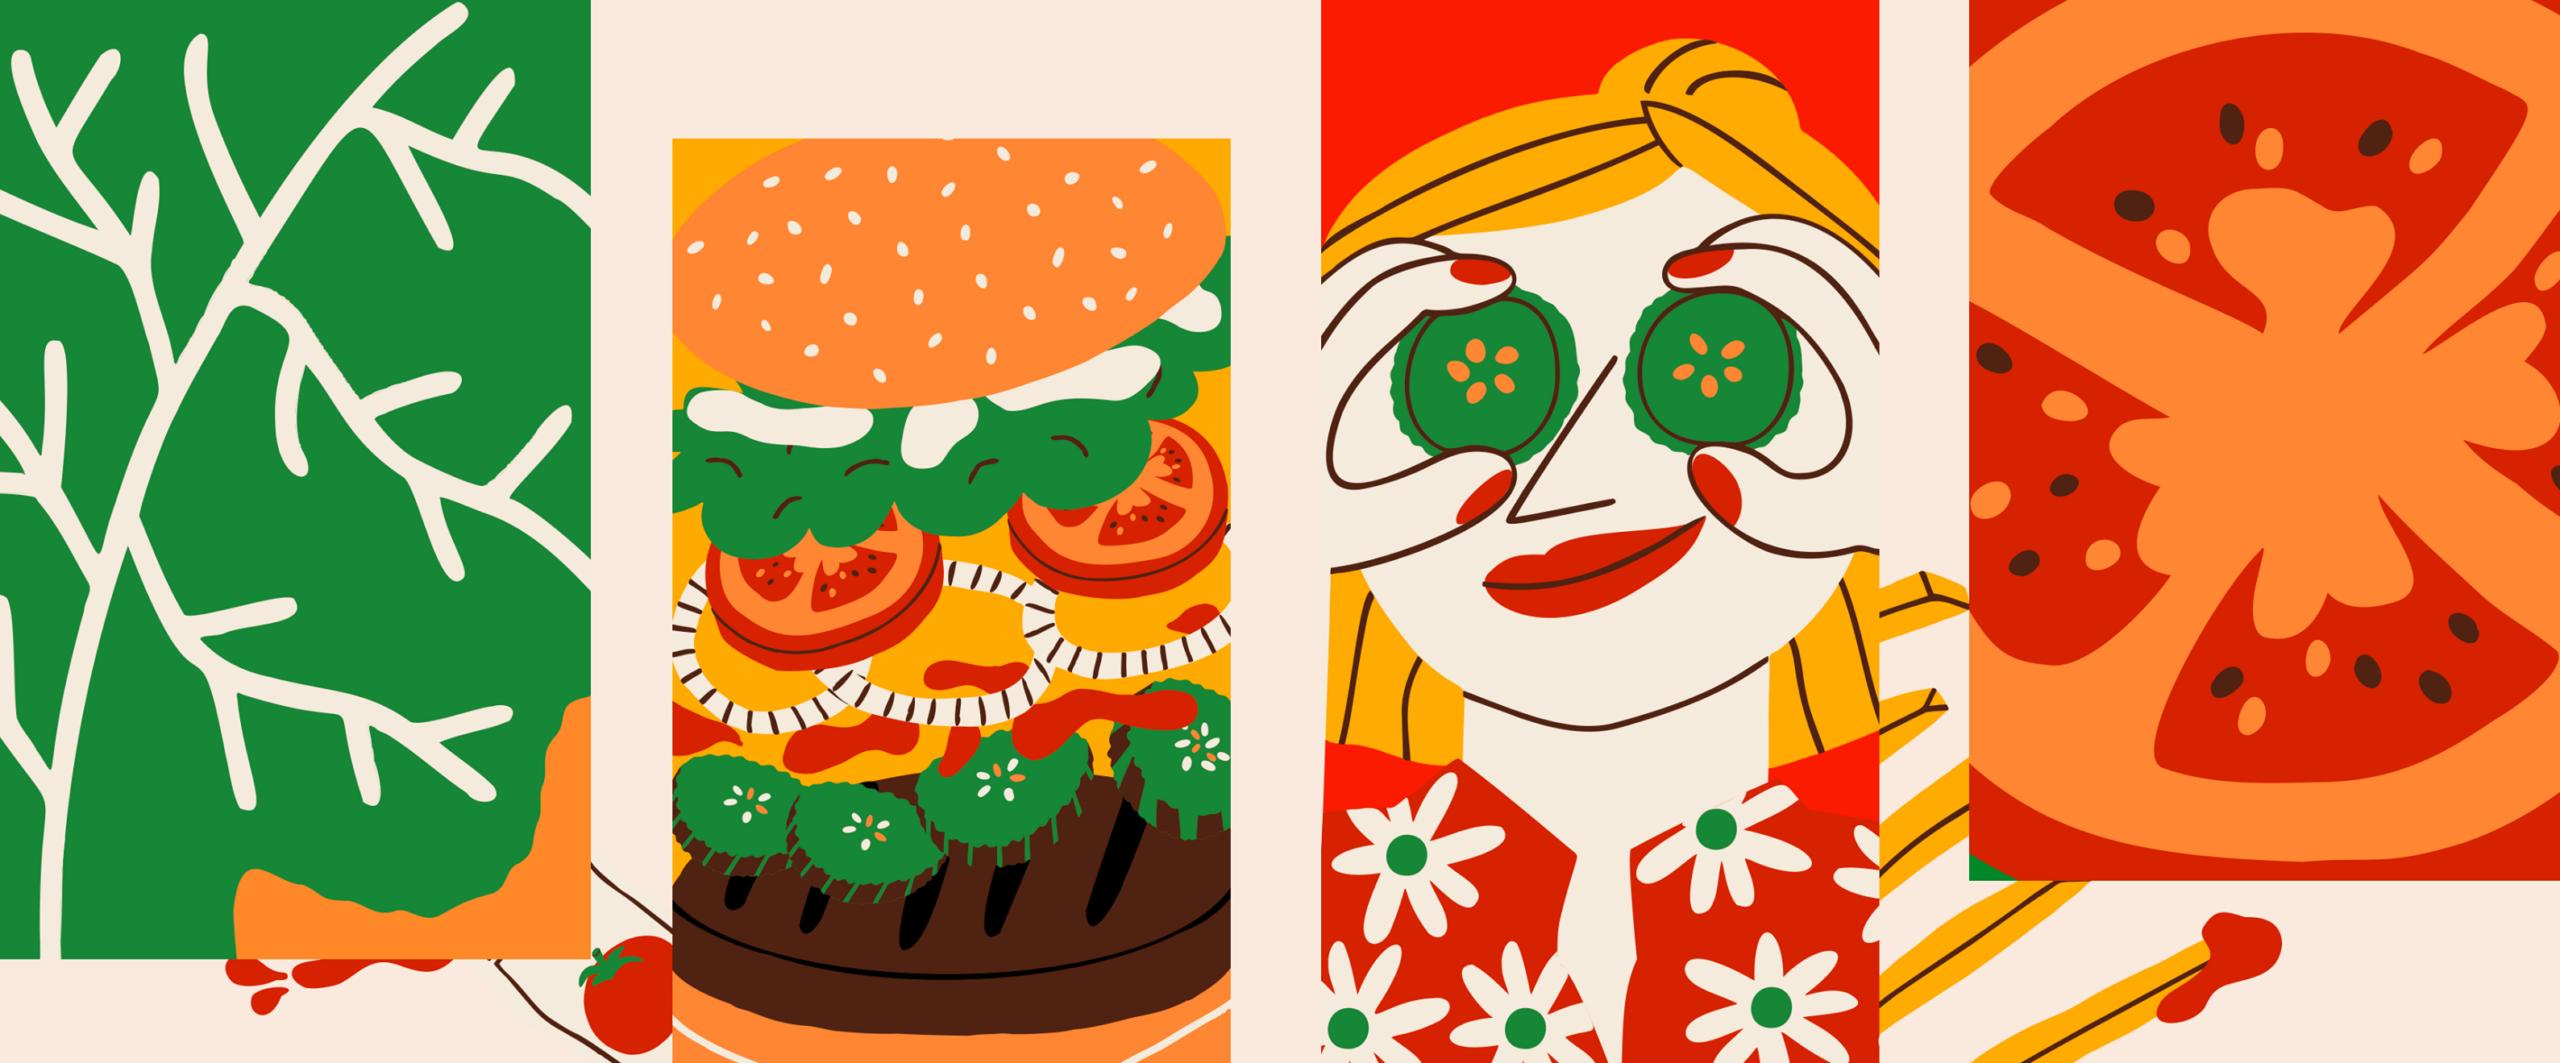 burger king rebranding campaign